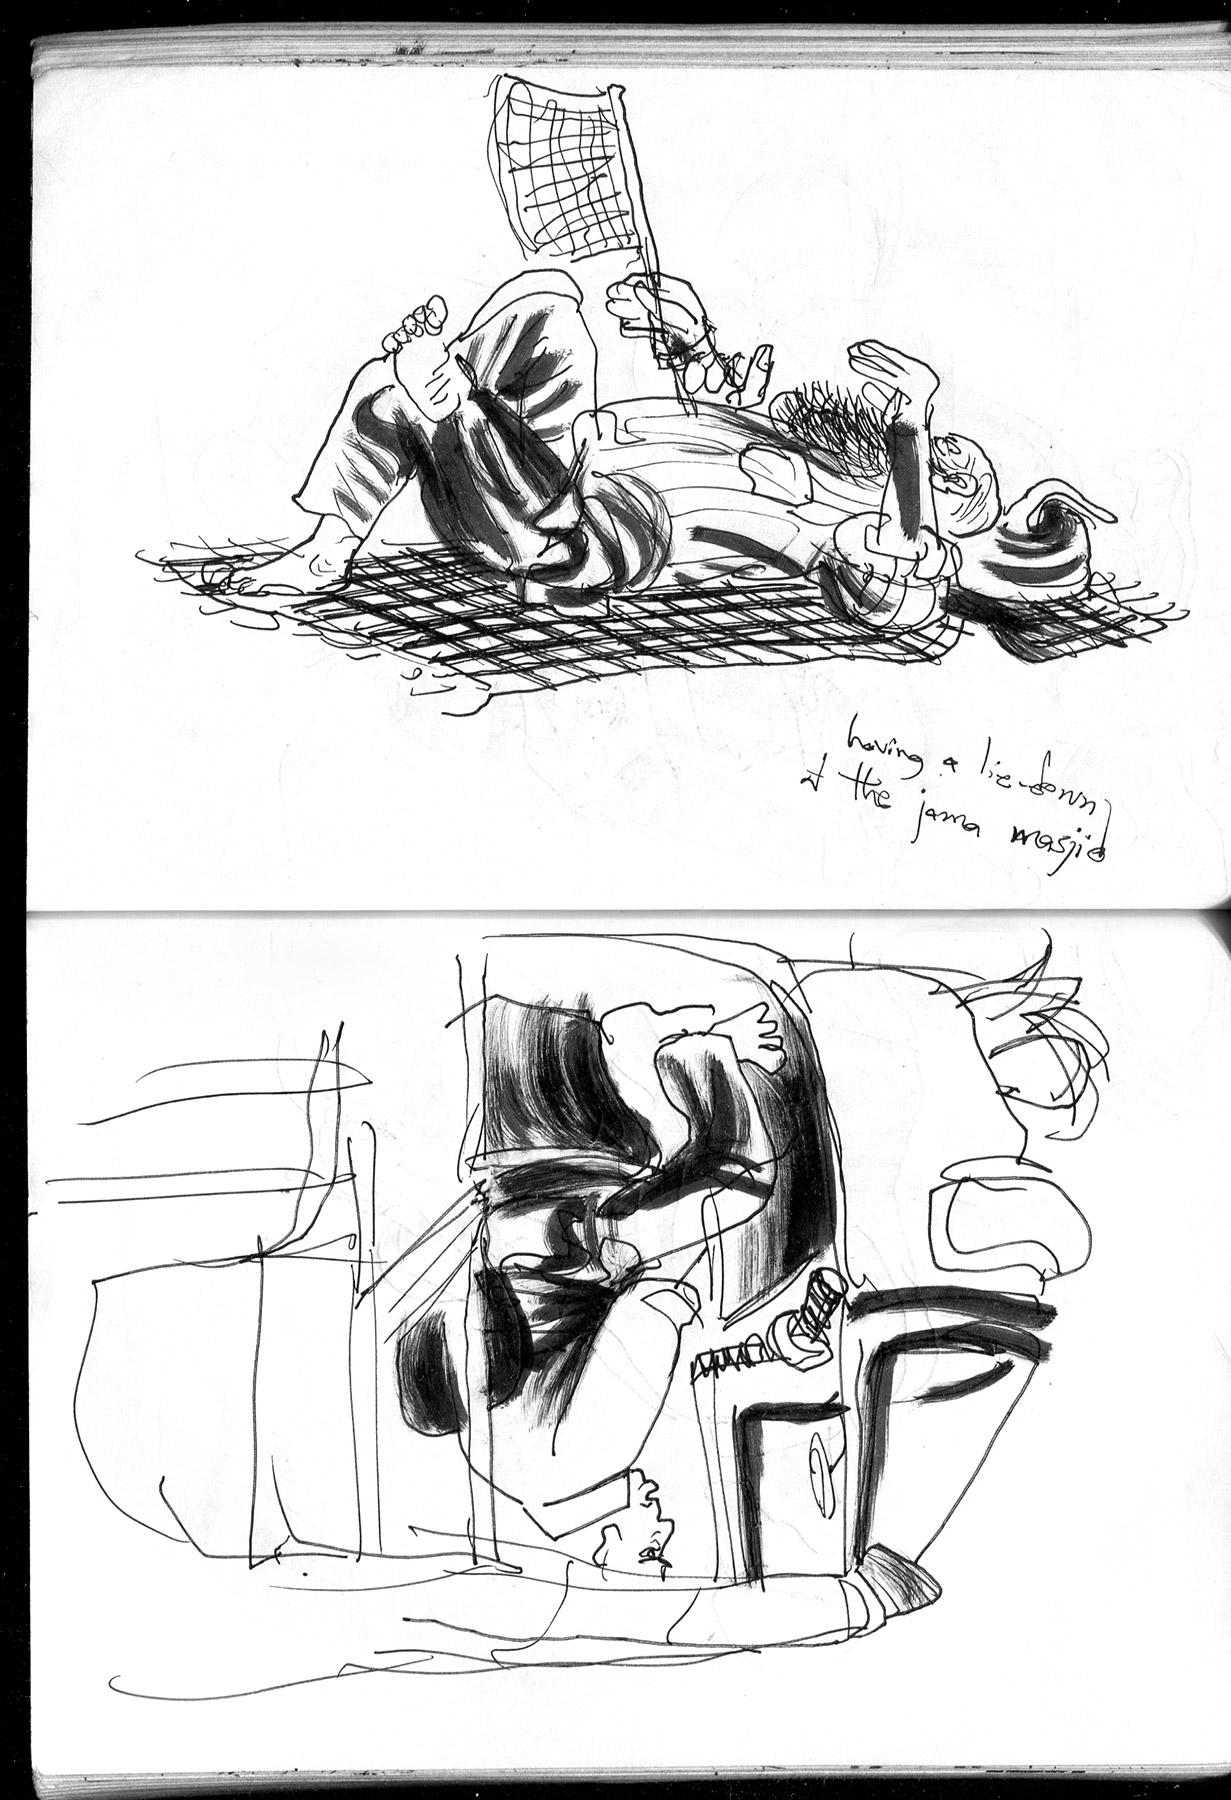 davidm_sketches_2014_08-033.jpg